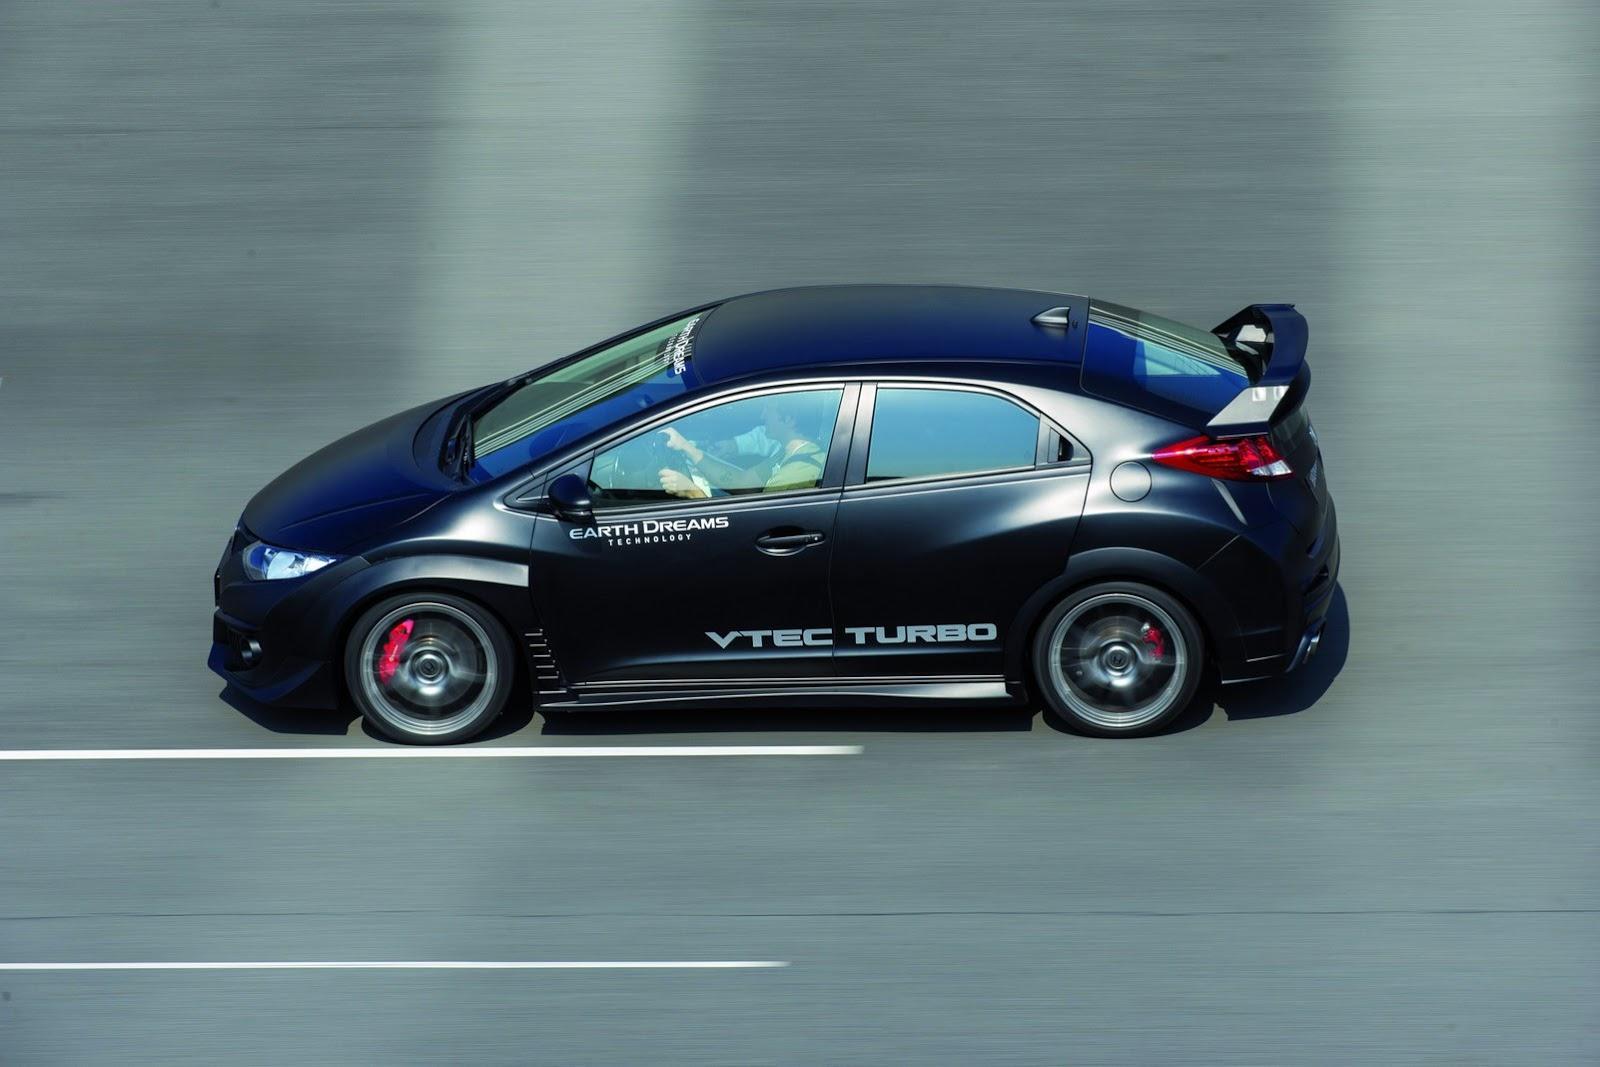 honda cars news 2015 civic type r unveiled. Black Bedroom Furniture Sets. Home Design Ideas